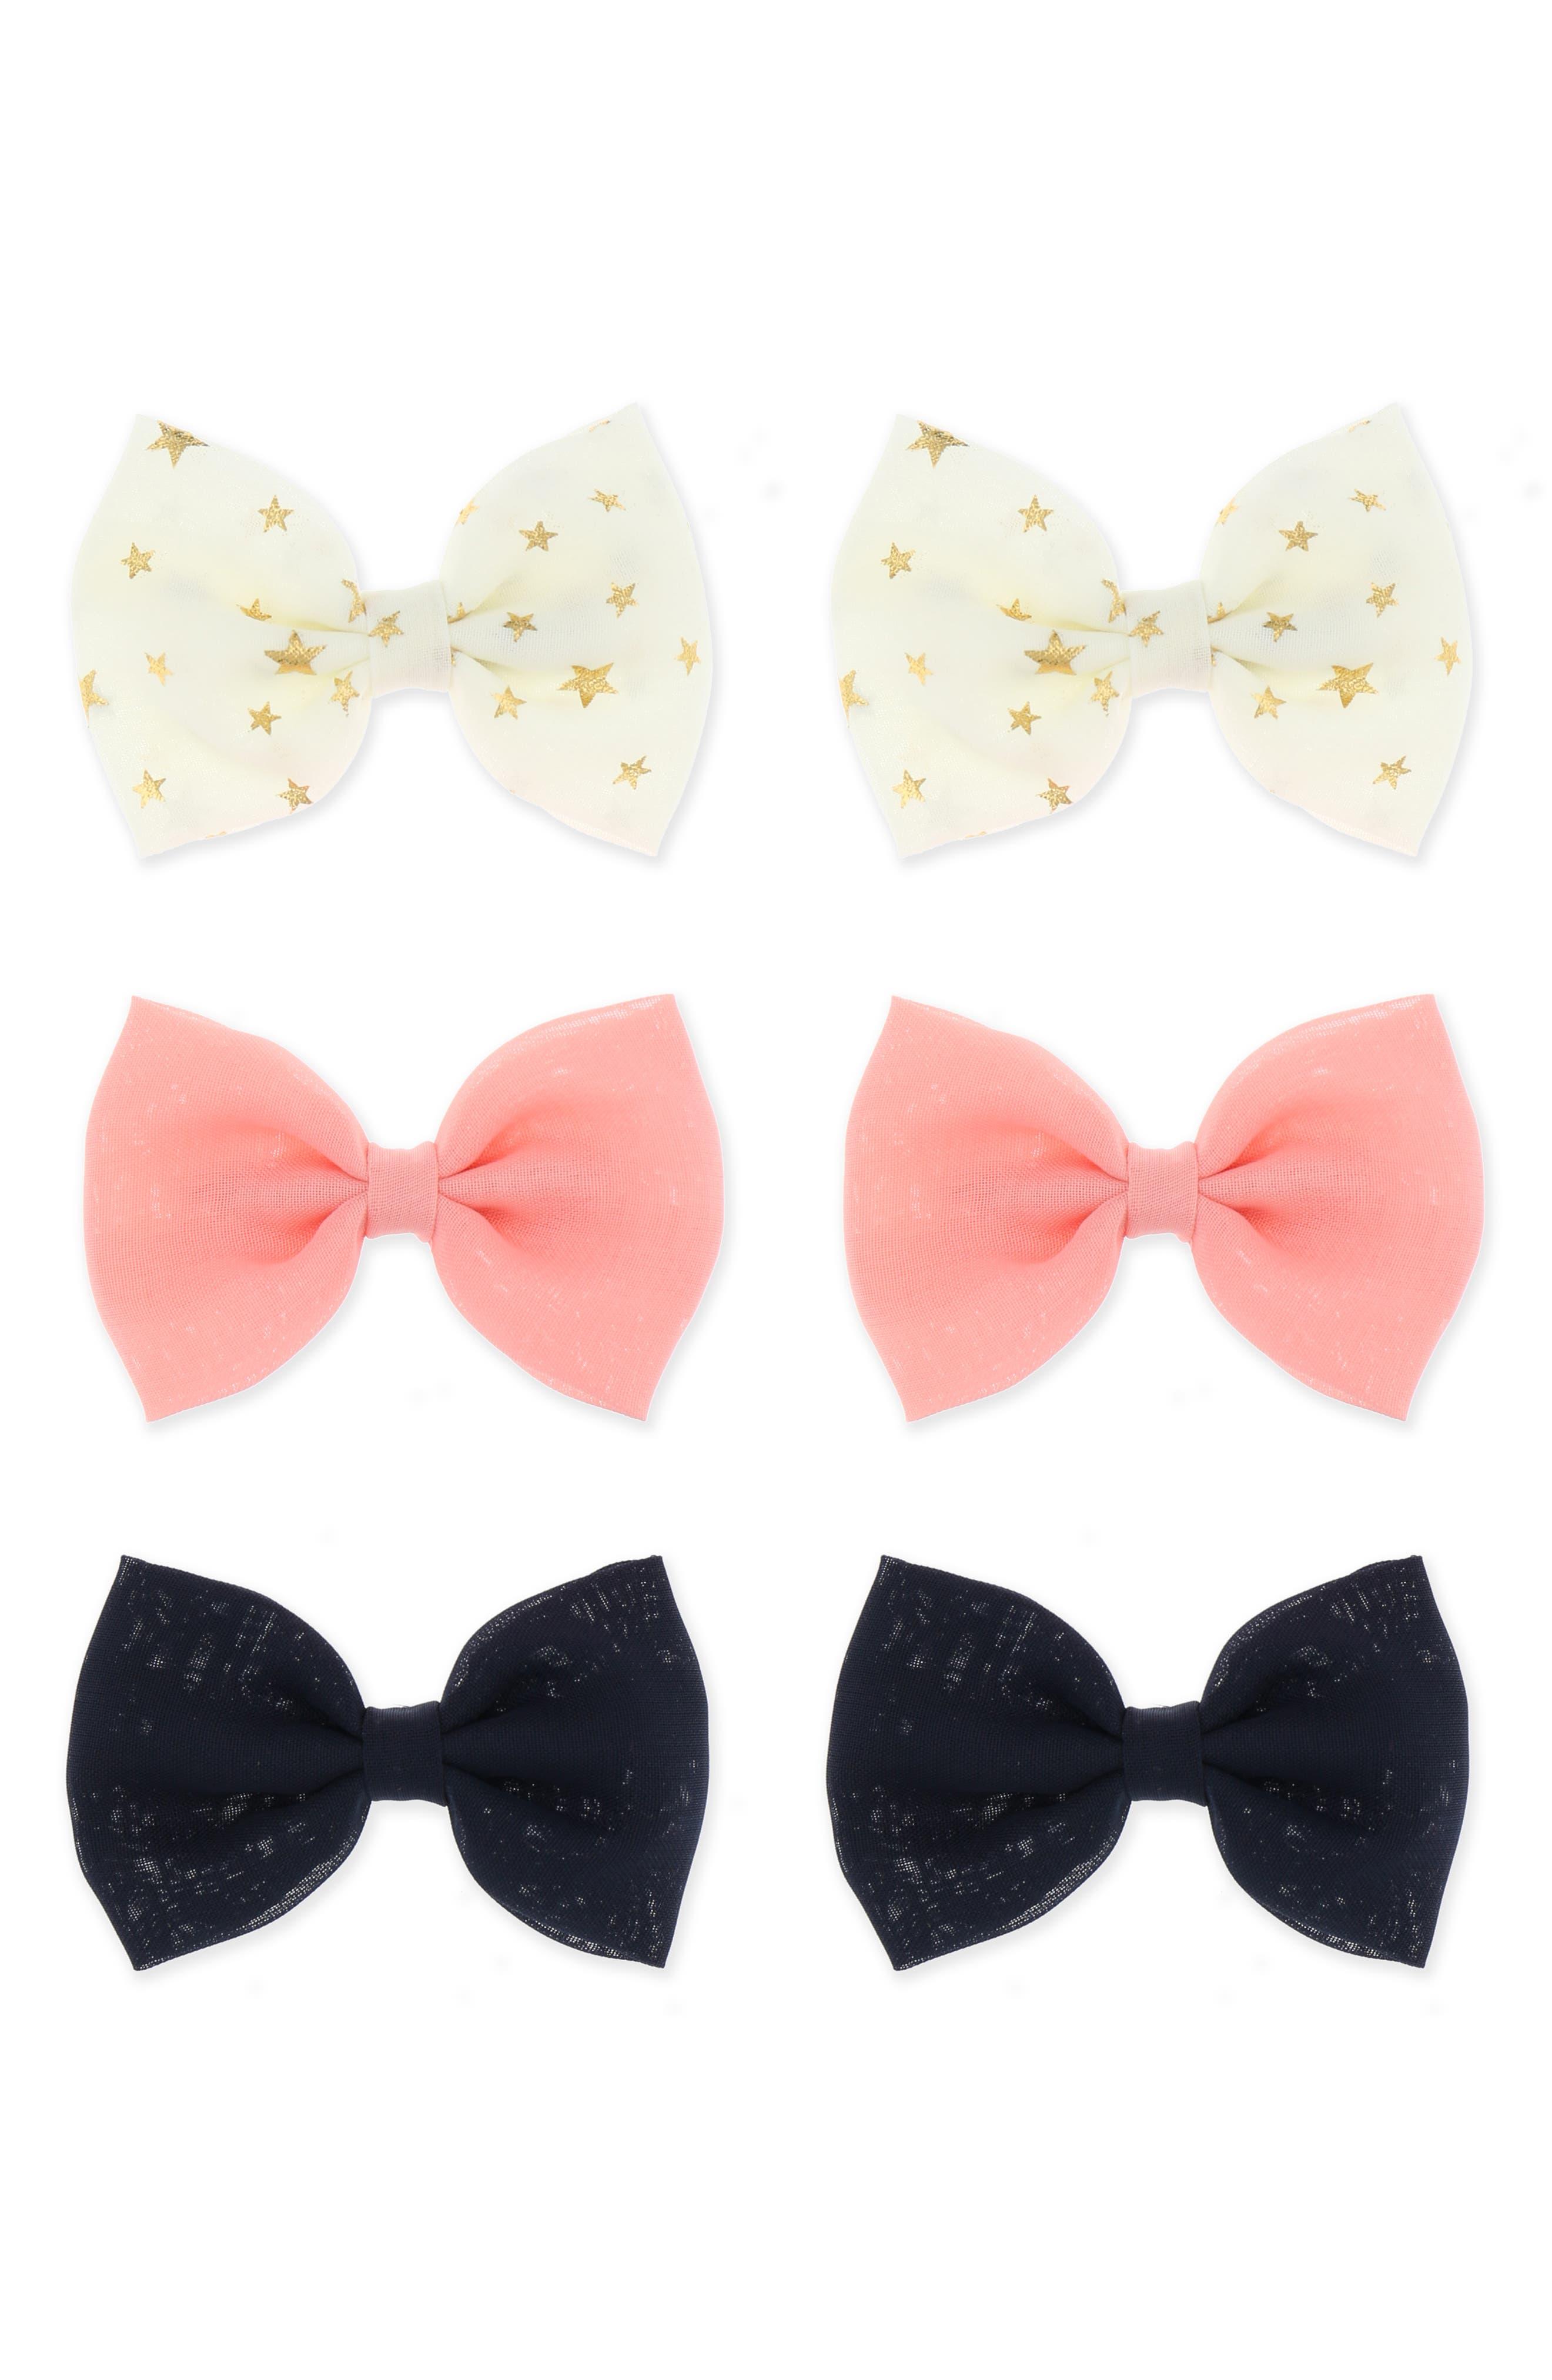 6-Piece Bow Star Hair Clip Set,                         Main,                         color, NAVY COMBO